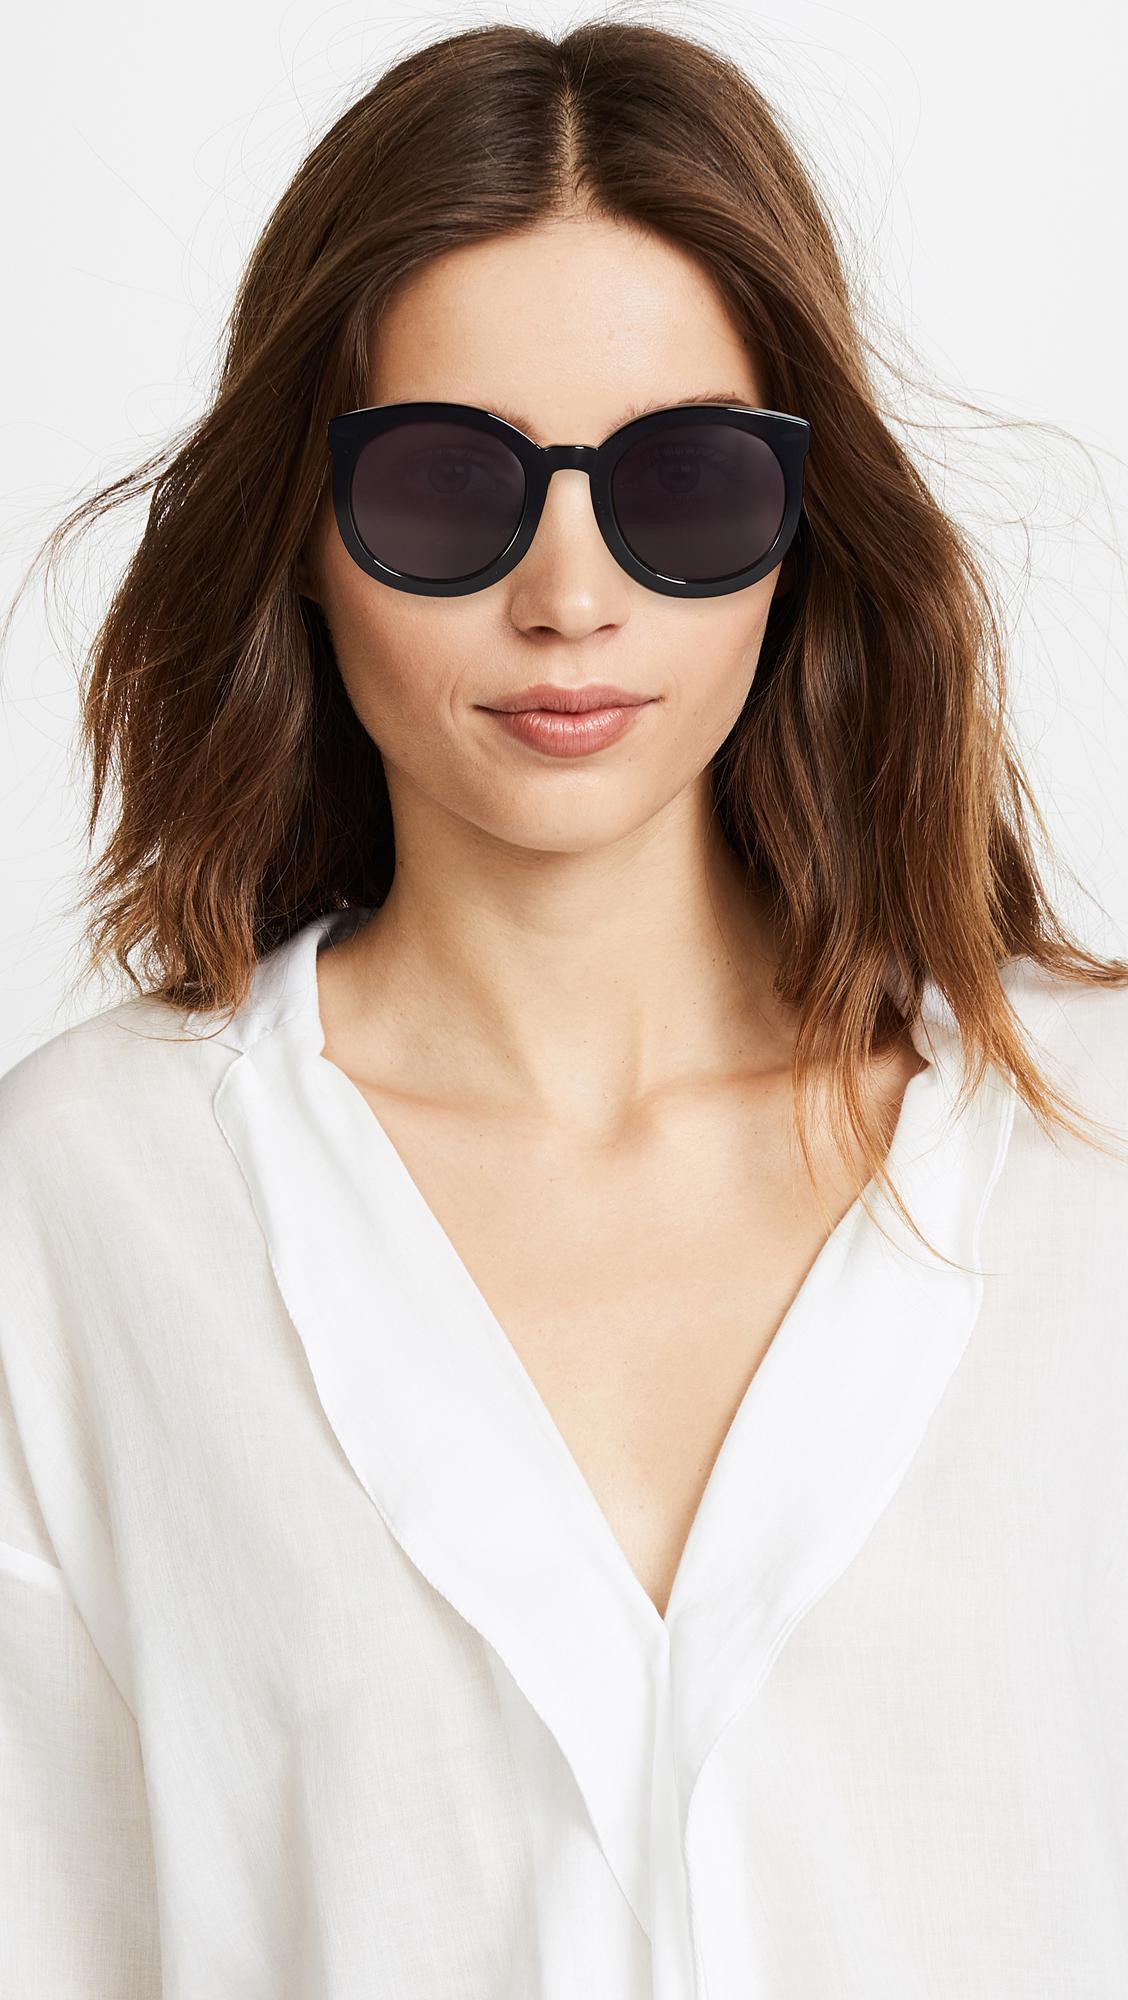 1d74d903abf Lyst - Karen Walker Super Duper Strength Sunglasses in Black - Save 11%